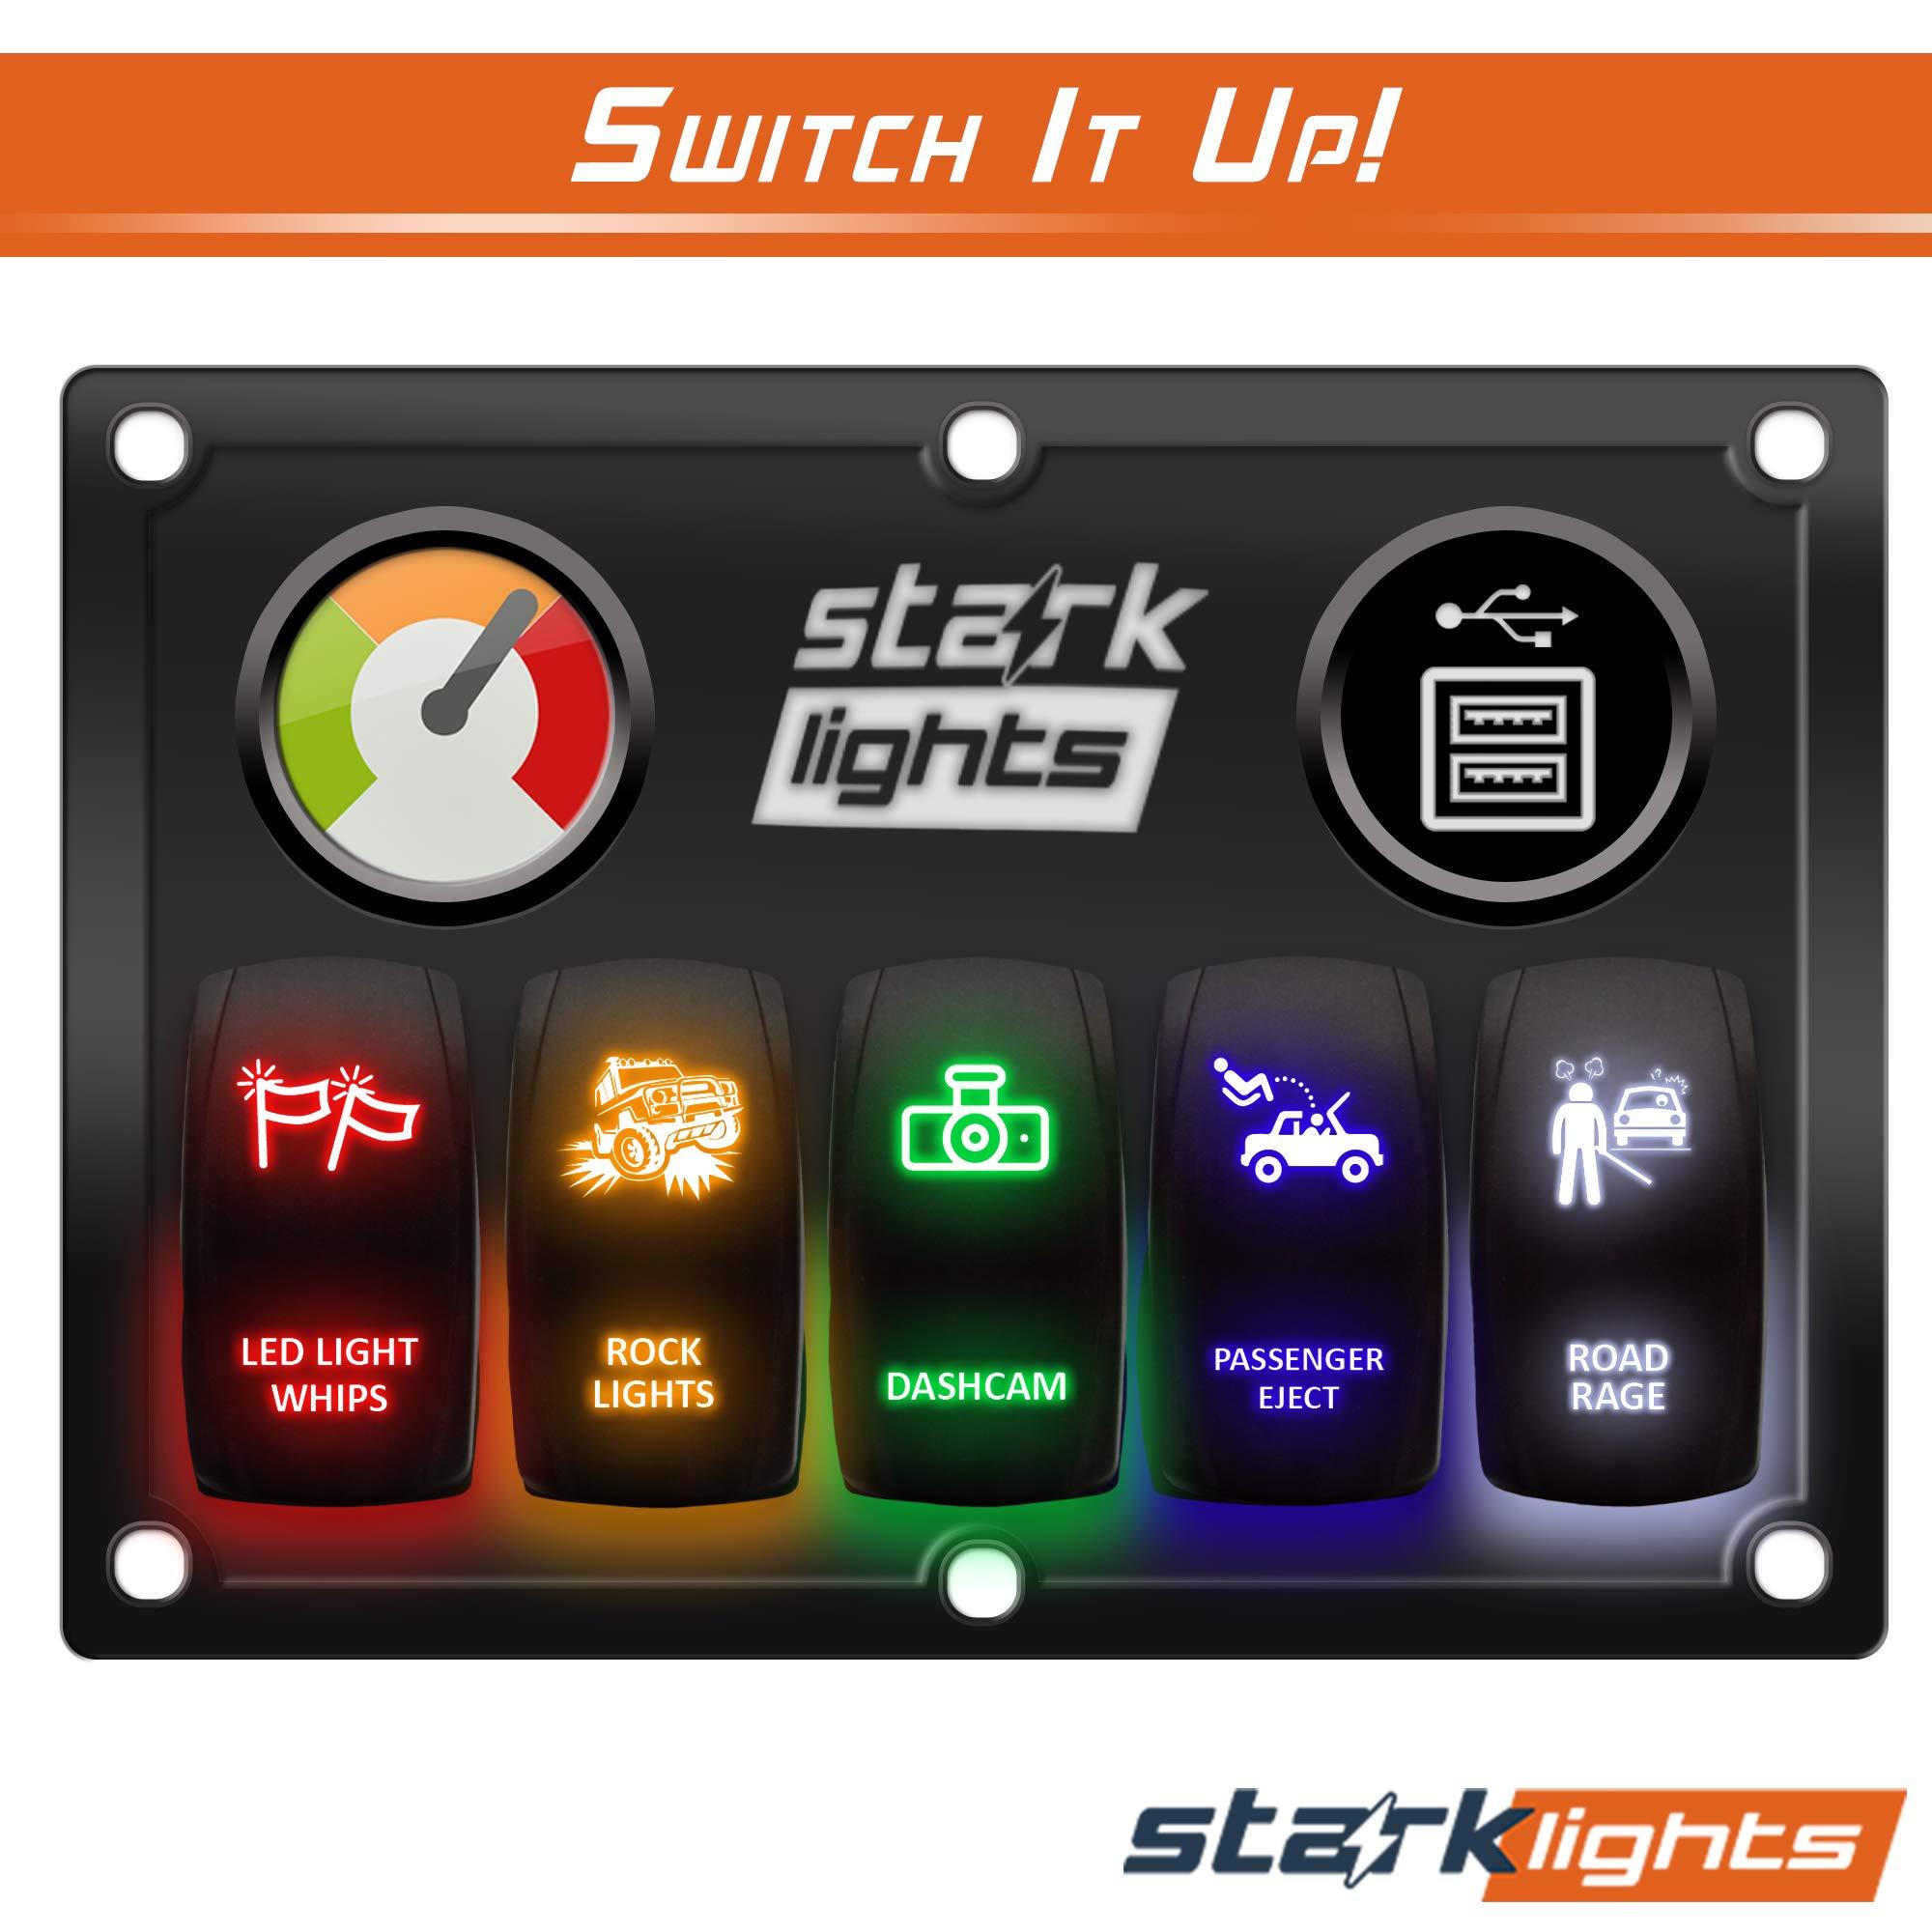 ROAD RAGE BLUE Laser Etched LED Rocker Switch 5 PIN Dual Light 20A 12V ON OFF